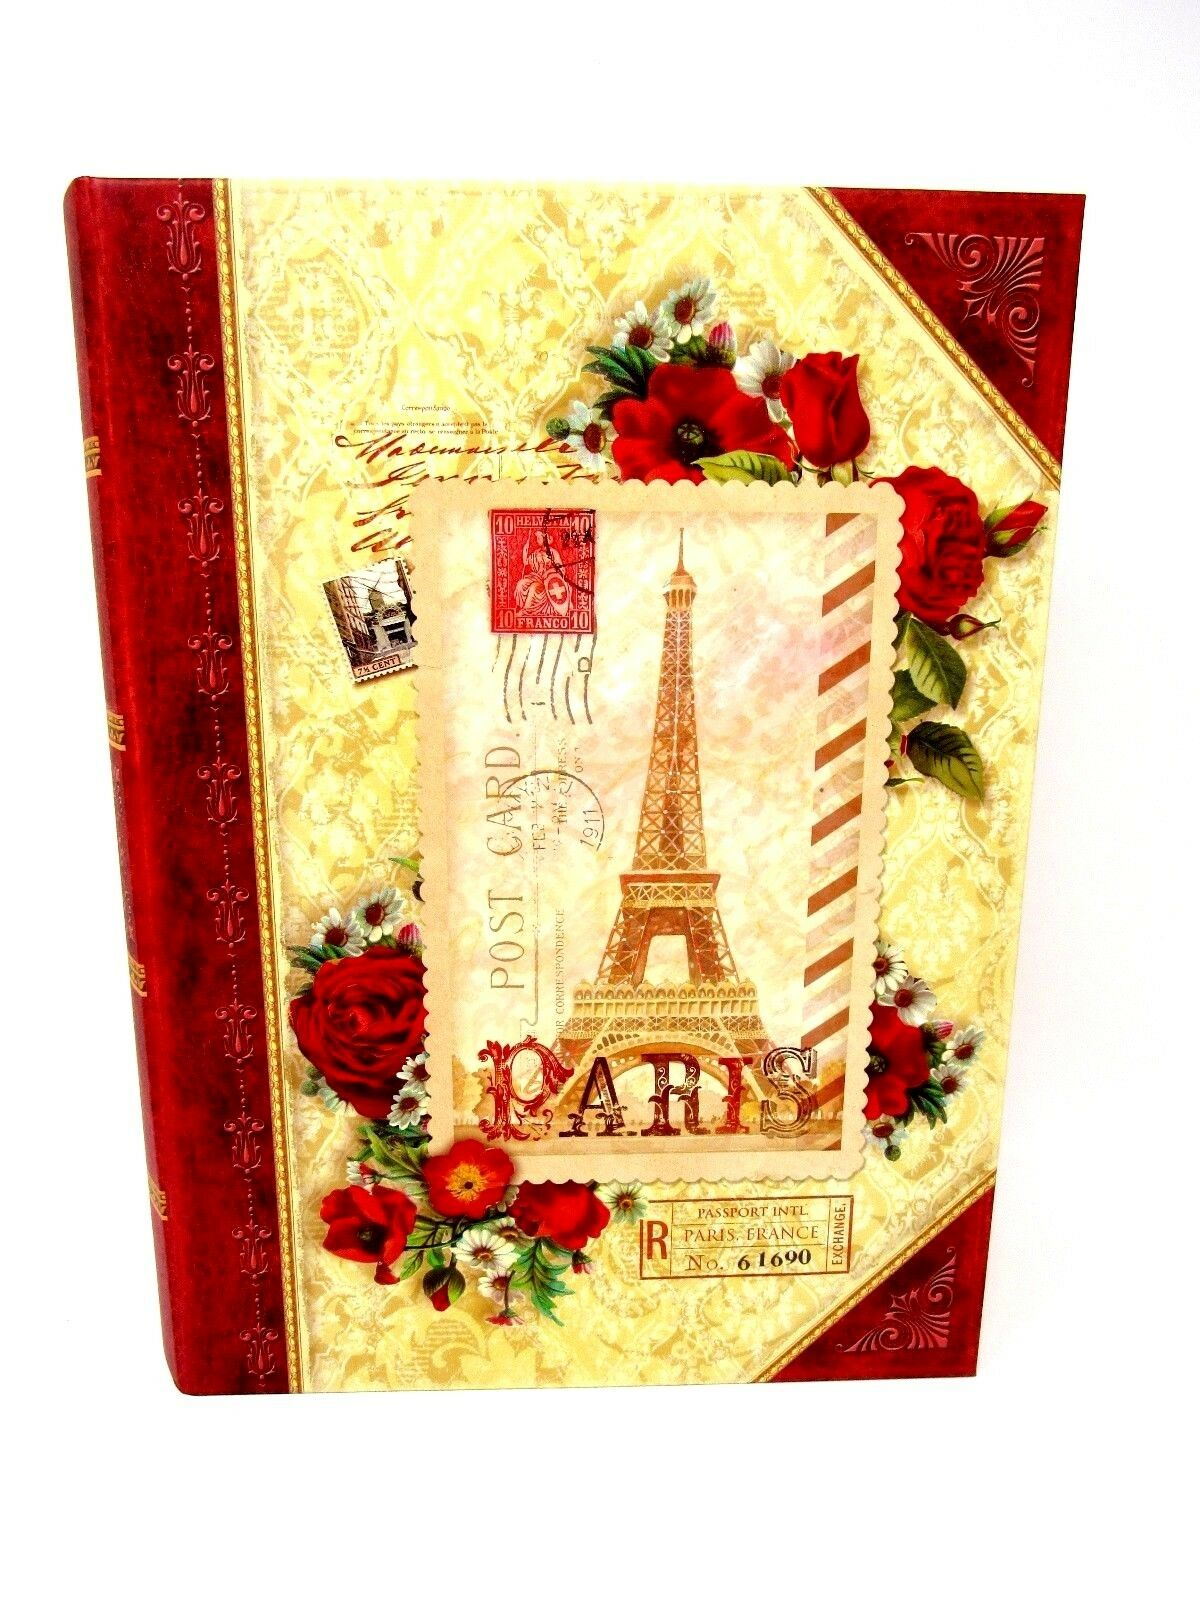 Pooch & Sweetheart Book Box Nesting Paris Red pinks 96134 Large Punch Studio